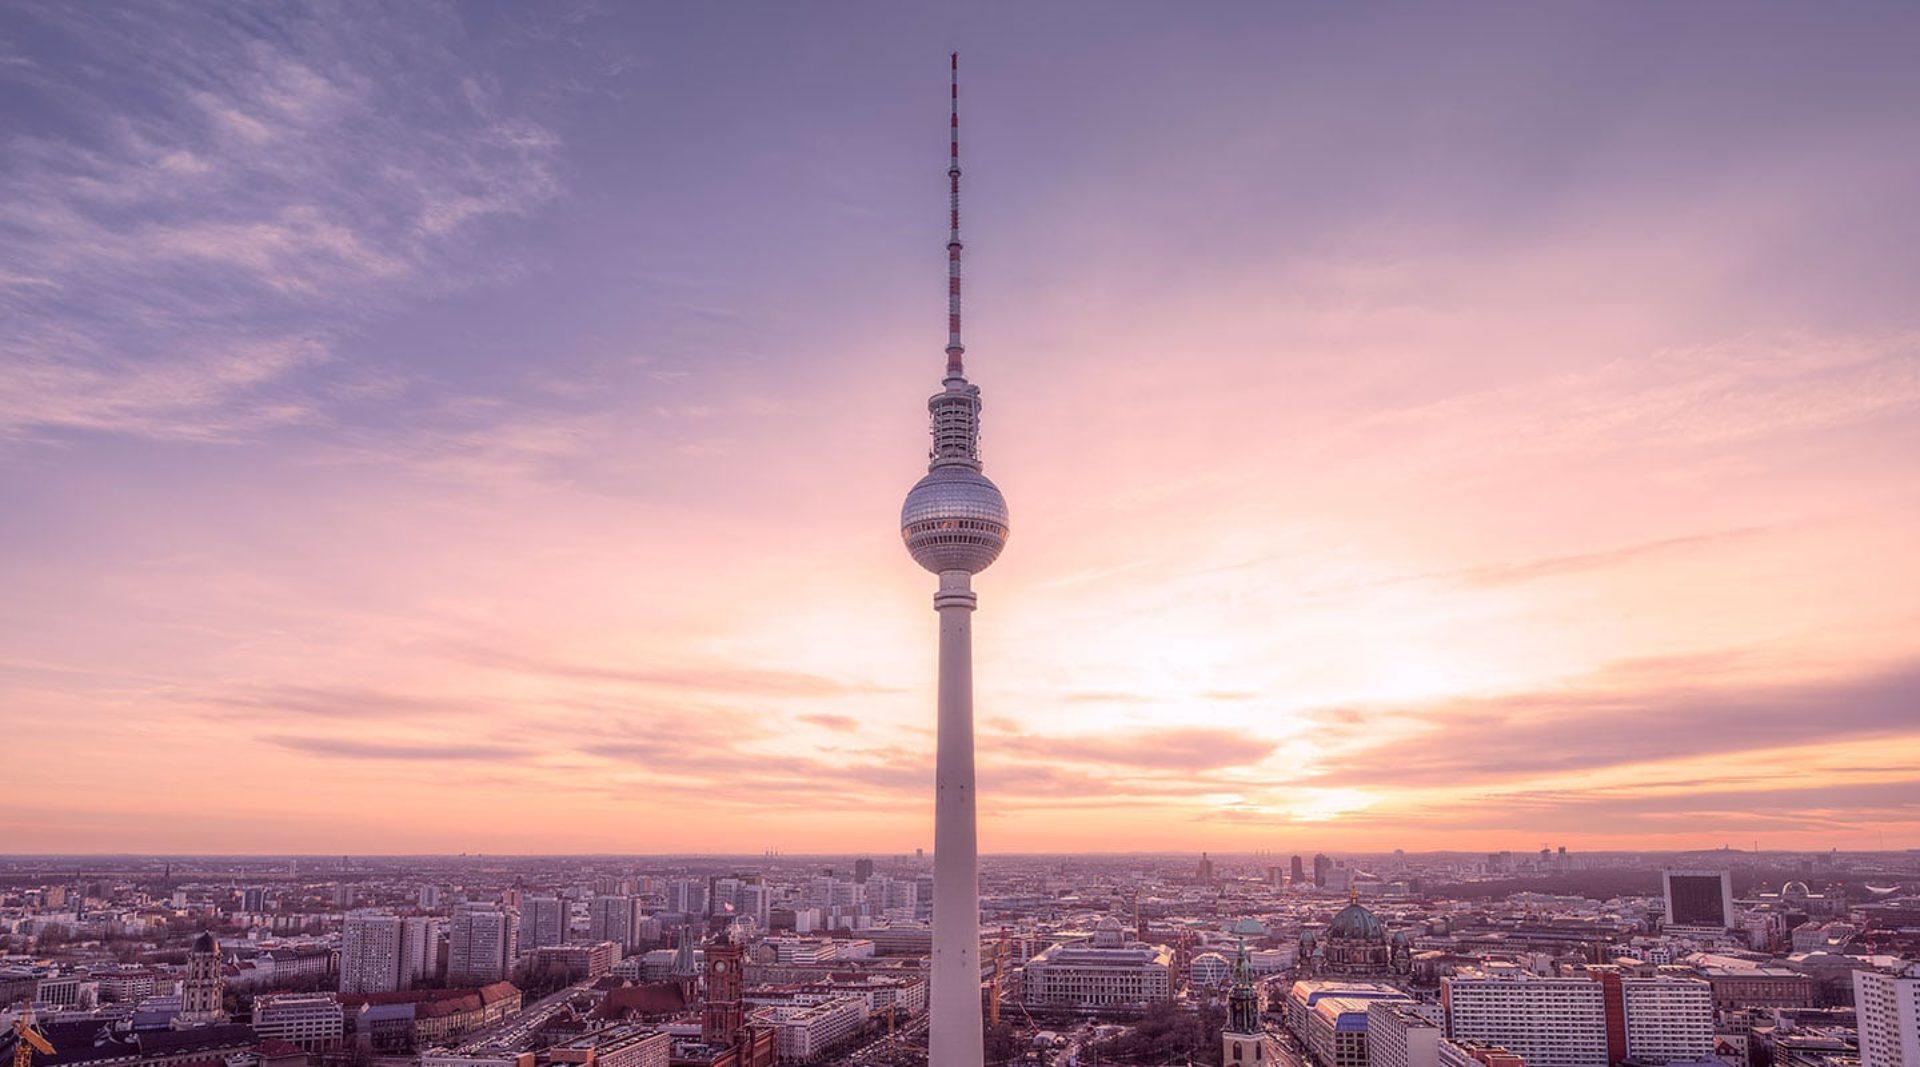 Berlin TV tower - M56 Group